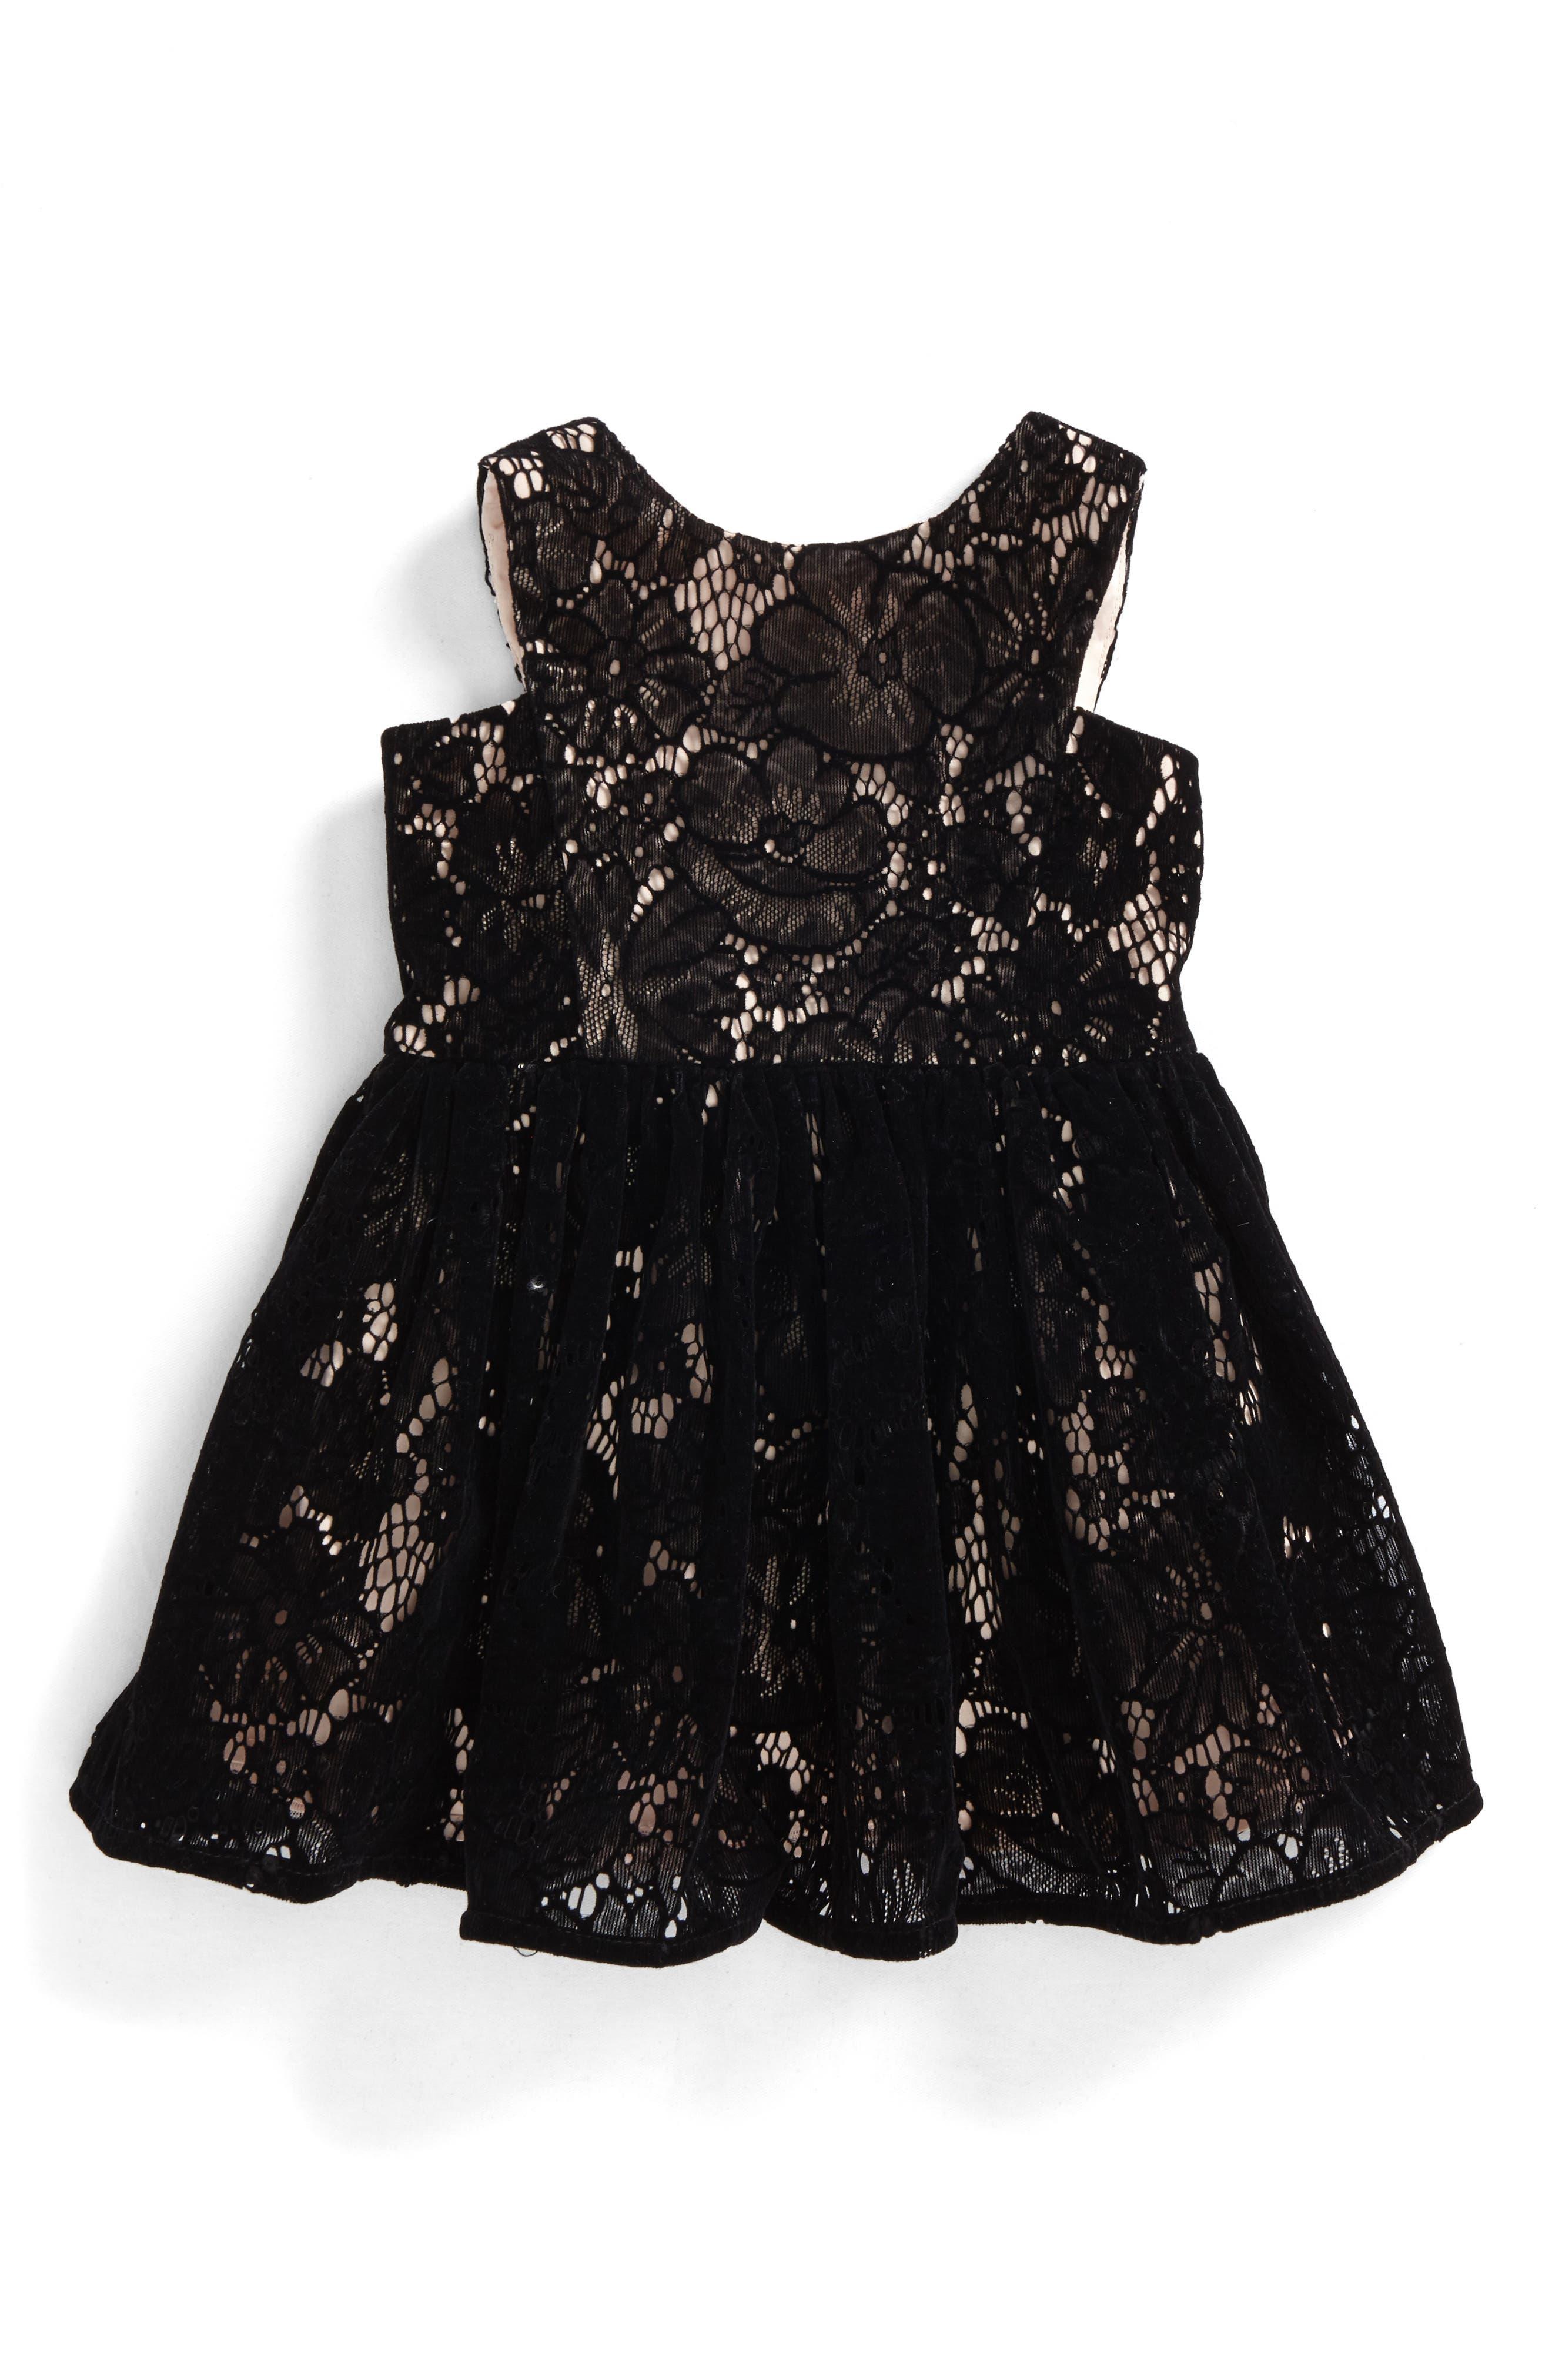 Flocked Lace Dress,                             Main thumbnail 1, color,                             001